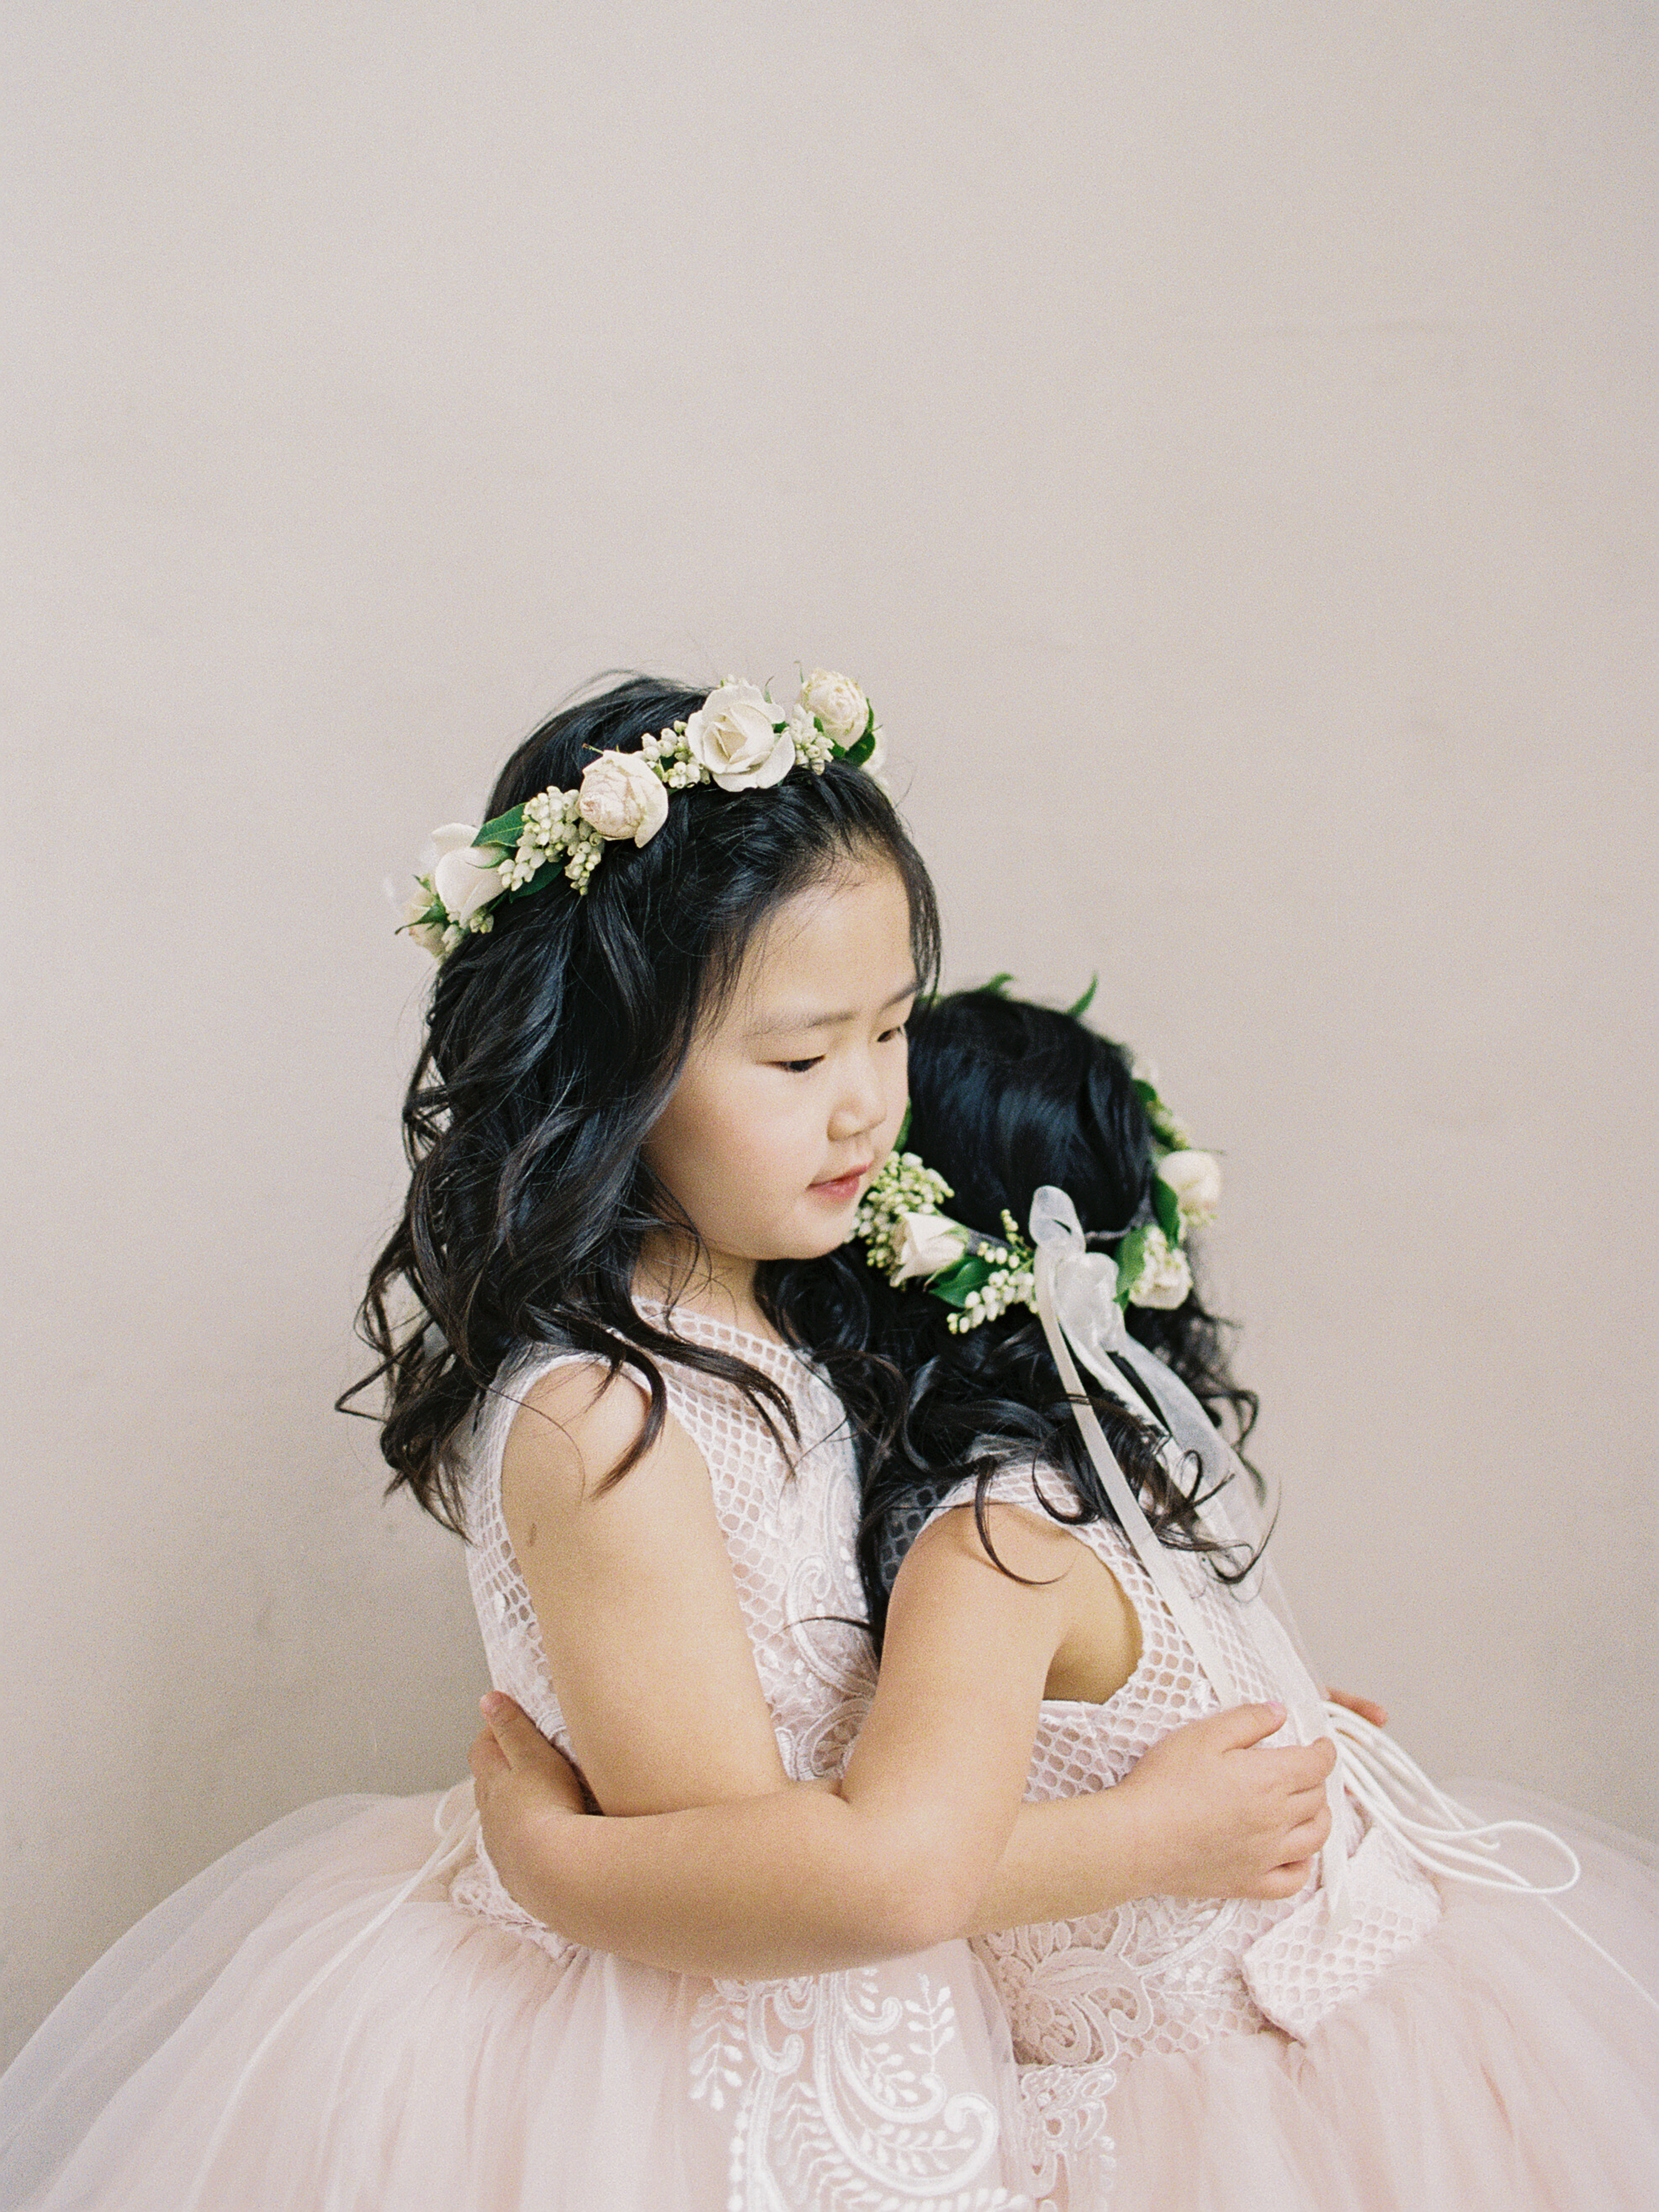 Athenaeum_Wedding_Hi_Res-9-Jen_Huang-005183-R1-029